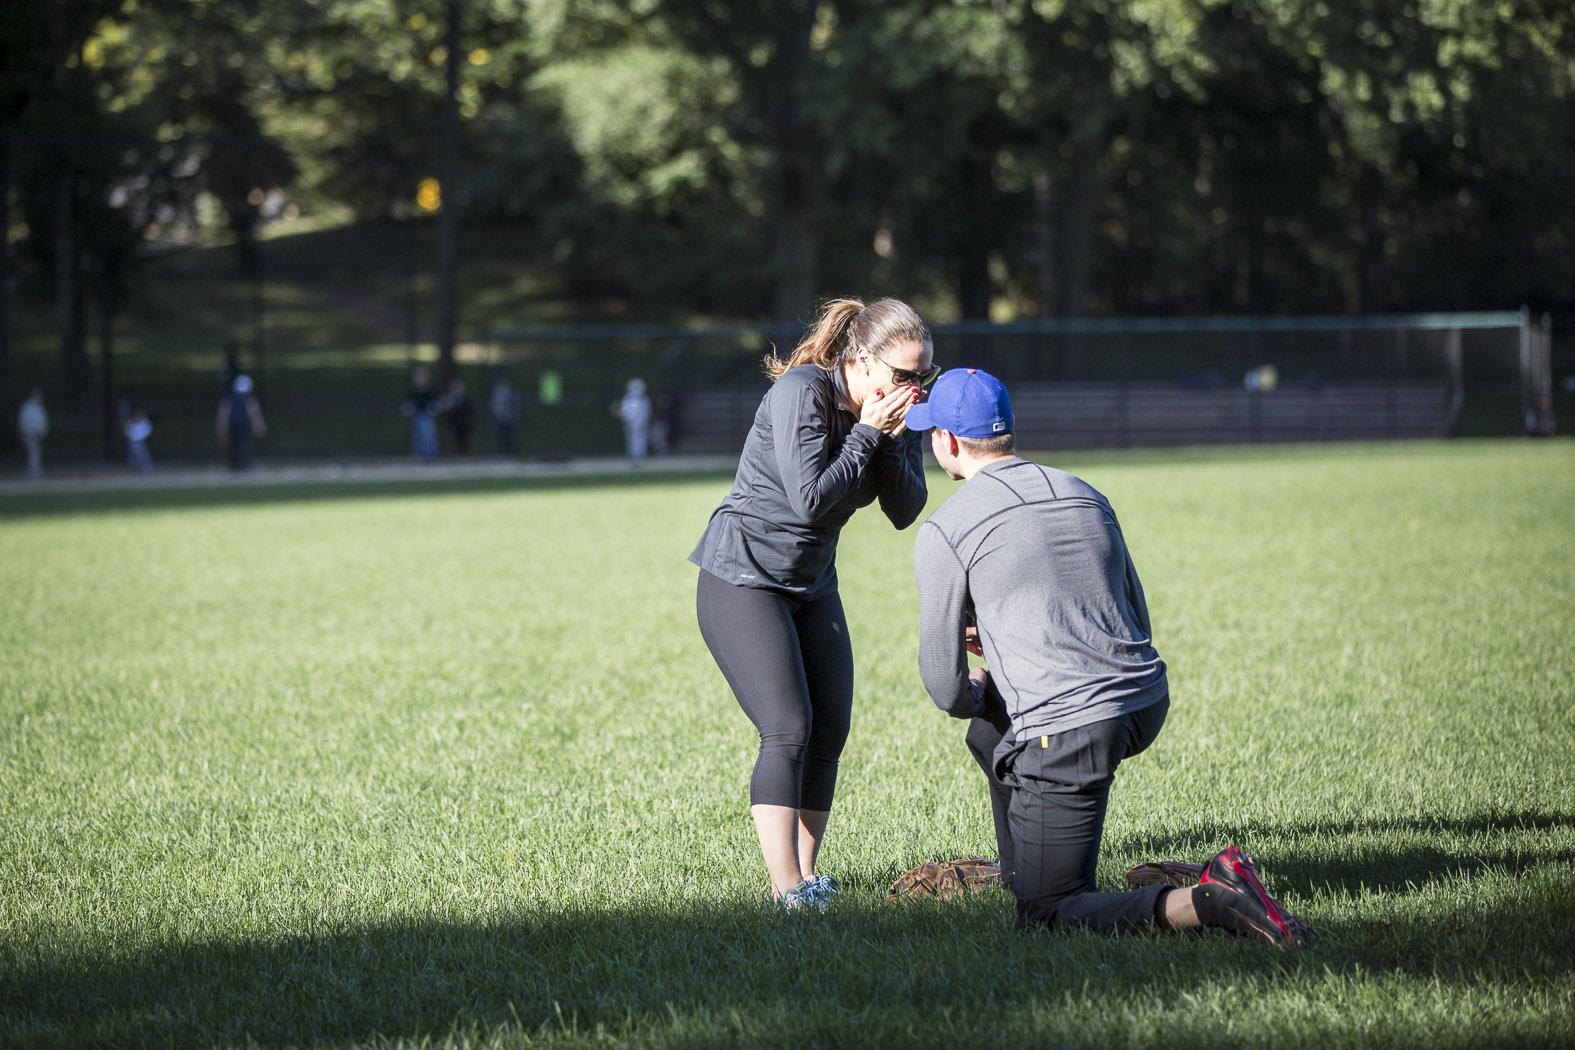 Central Park Baseball Proposal